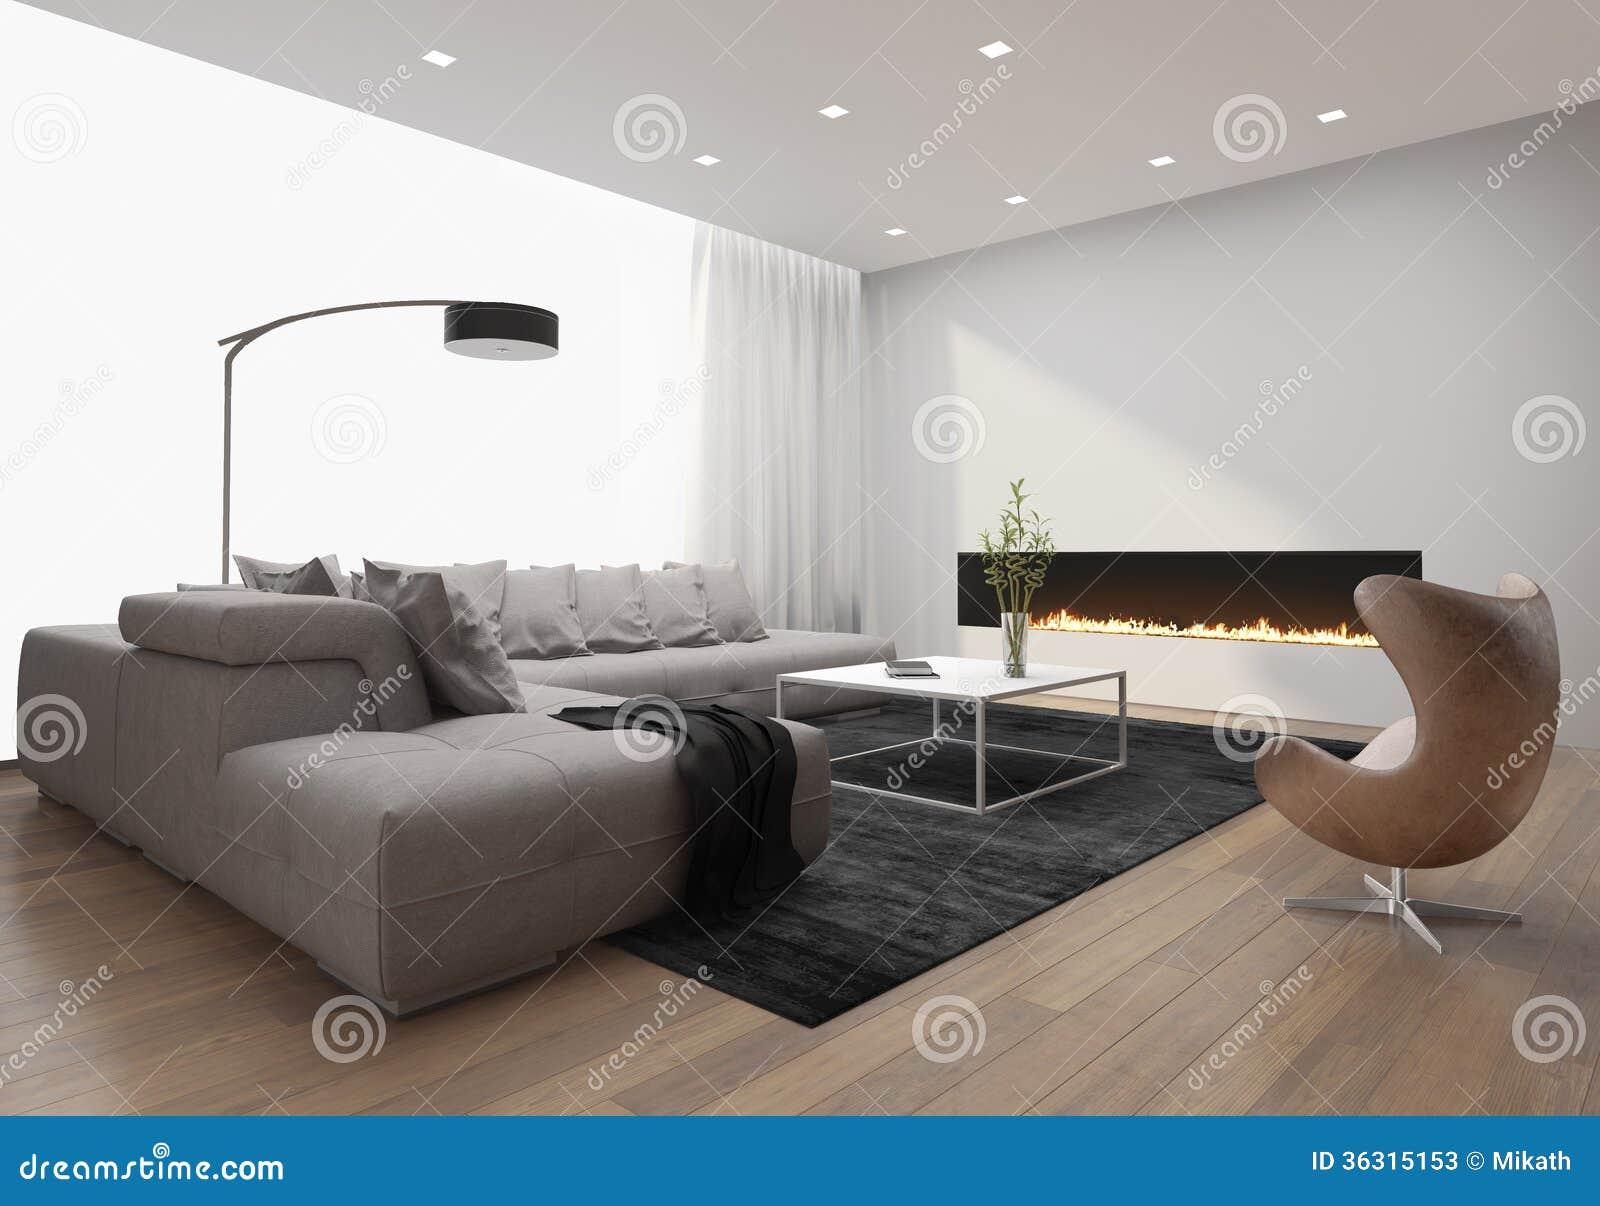 Contemporary stylish loft interior, with modern fireplace